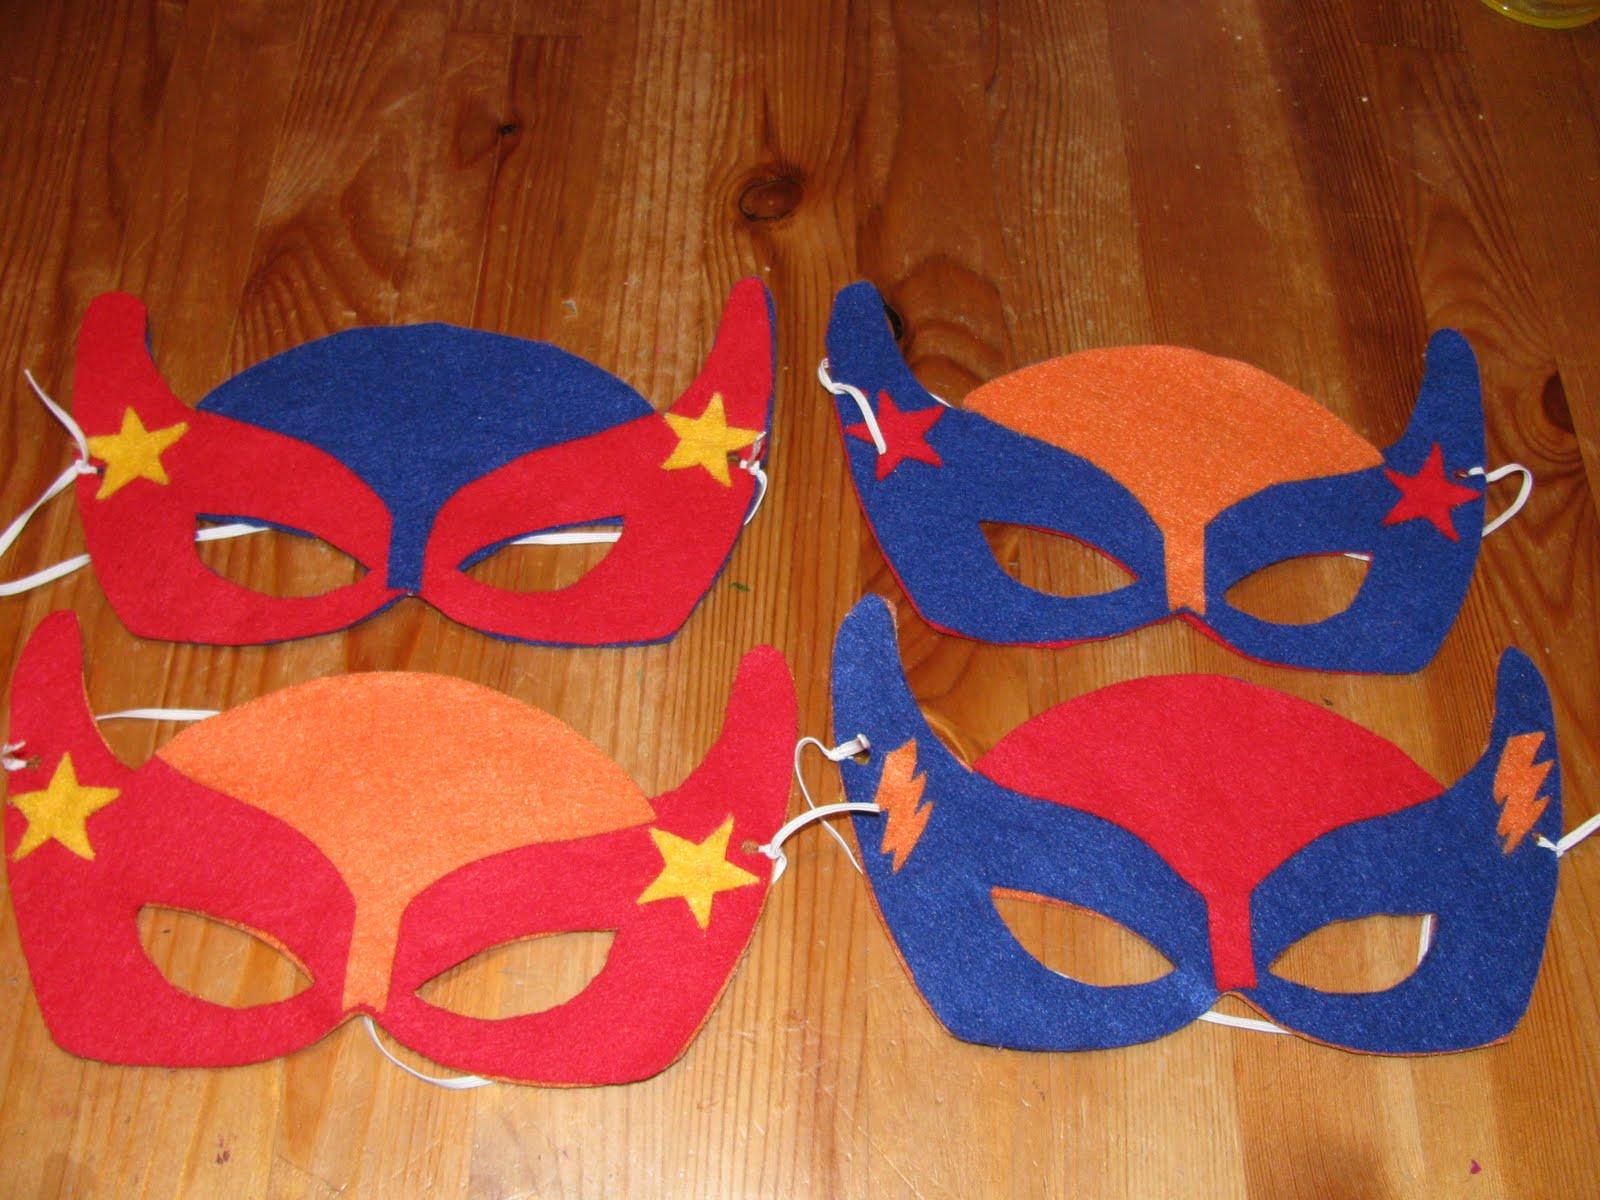 DIY Superhero Mask Template  My Crafty Playground DIY Superhero masks